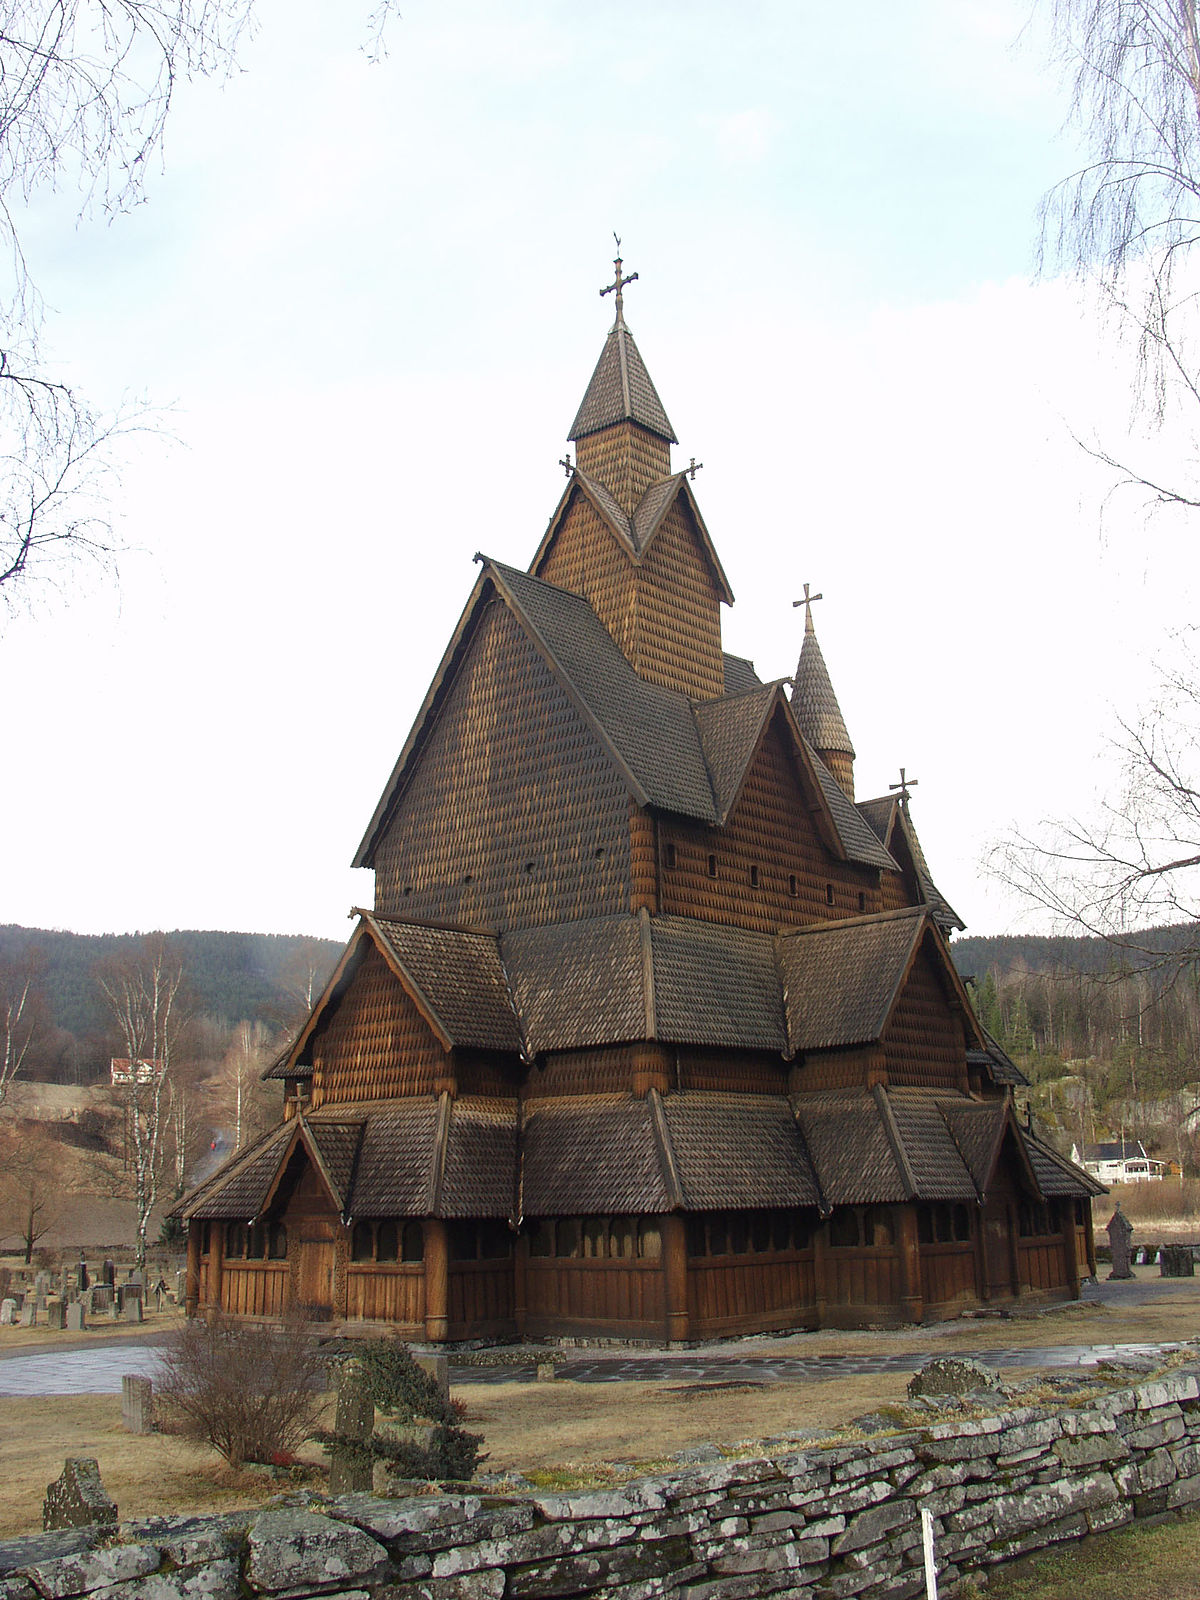 stavkirker i norge kart Liste over stavkirker i Norge – Wikipedia stavkirker i norge kart